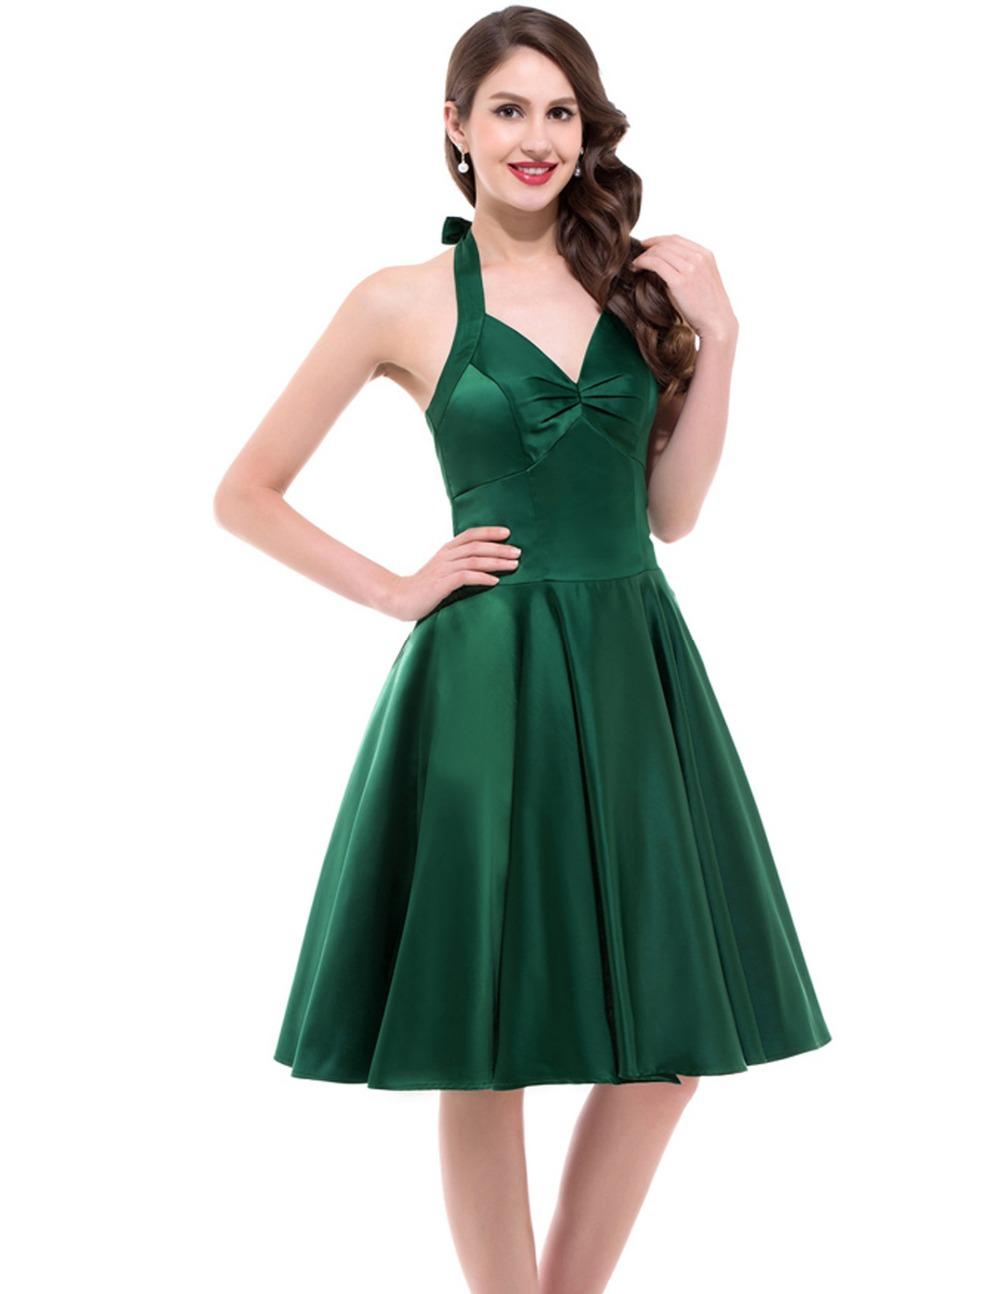 Audrey Hepburn Style 1950s Vintage Dresses Spring Garden Party Picnic Dress Halter Design Pinup Swing Women Summer Dress(China (Mainland))